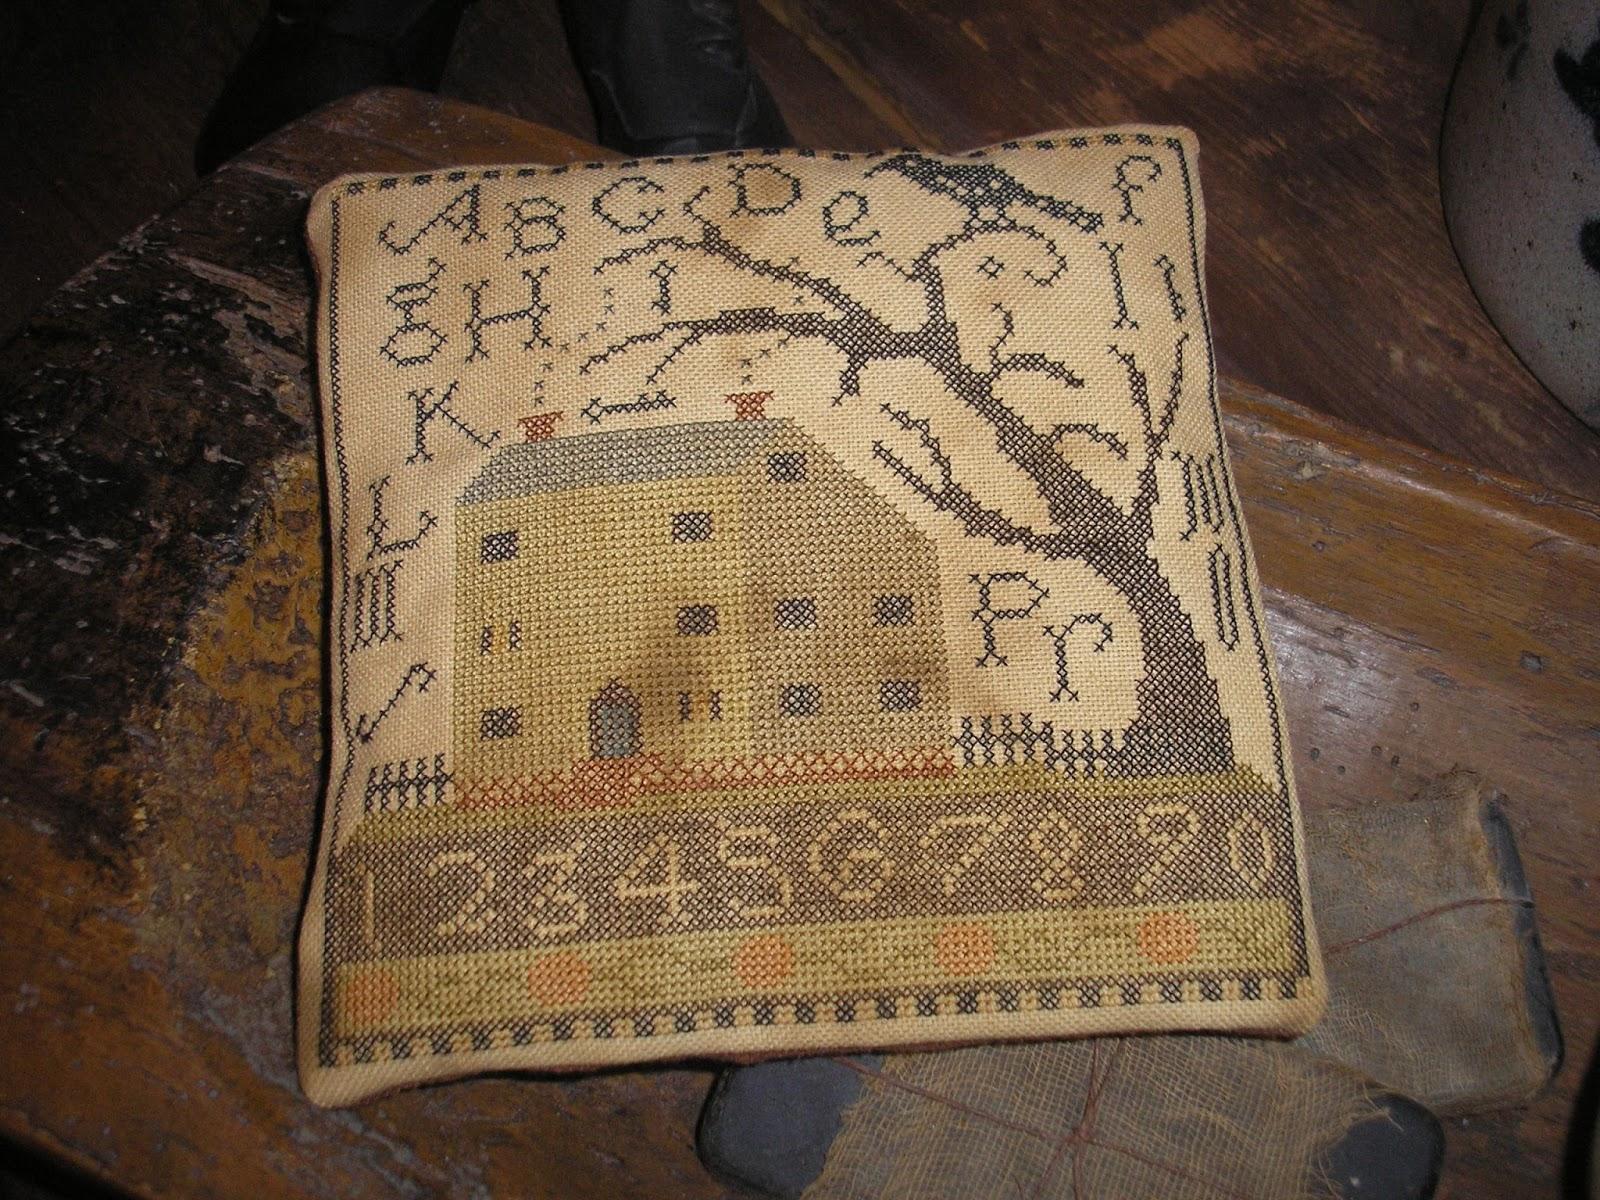 Taylors Farmhouse Attic New Autumn Offerings